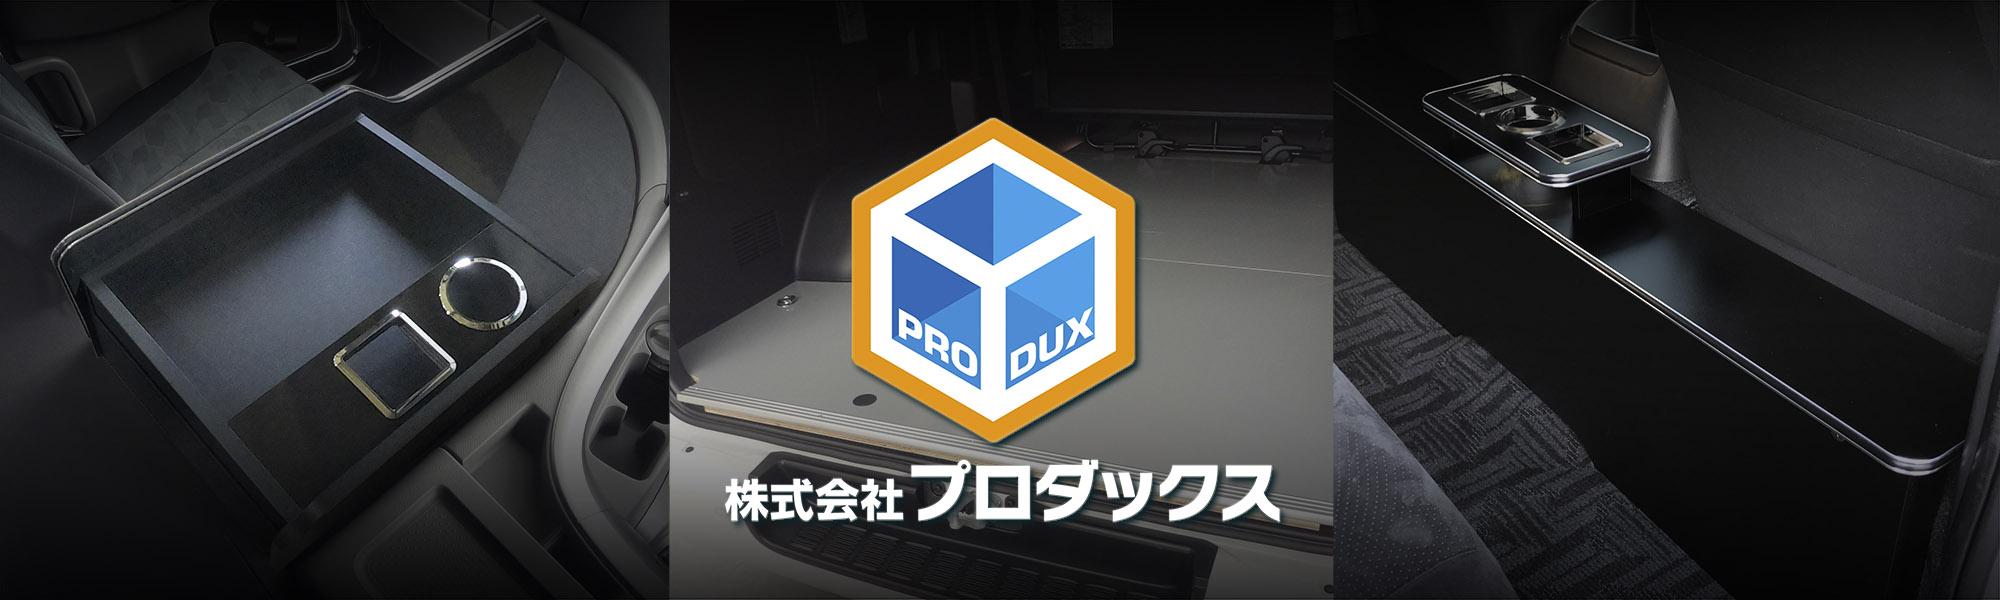 SunBox